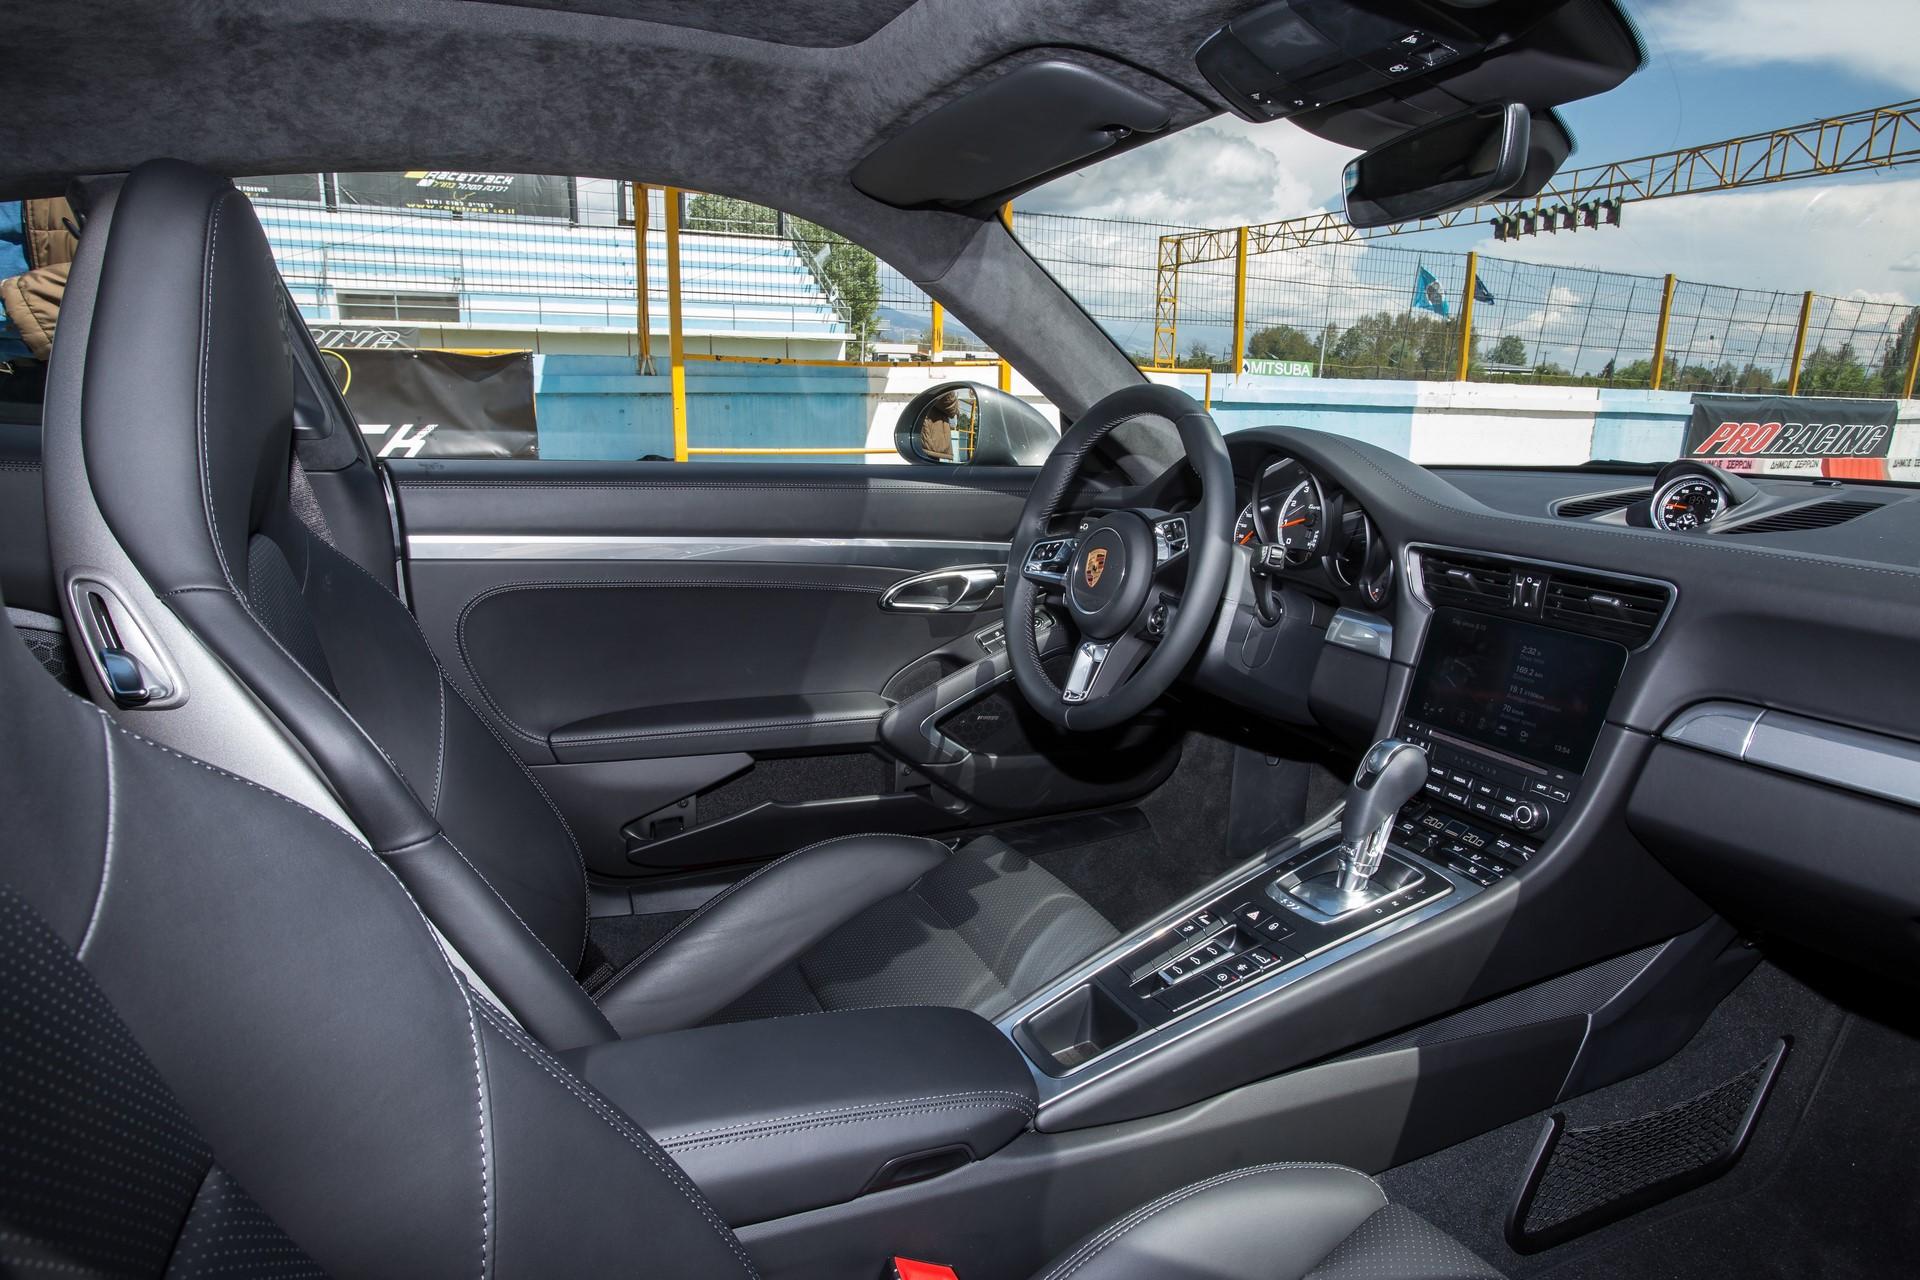 Porsche Driving Experience 2017 Serres (16)